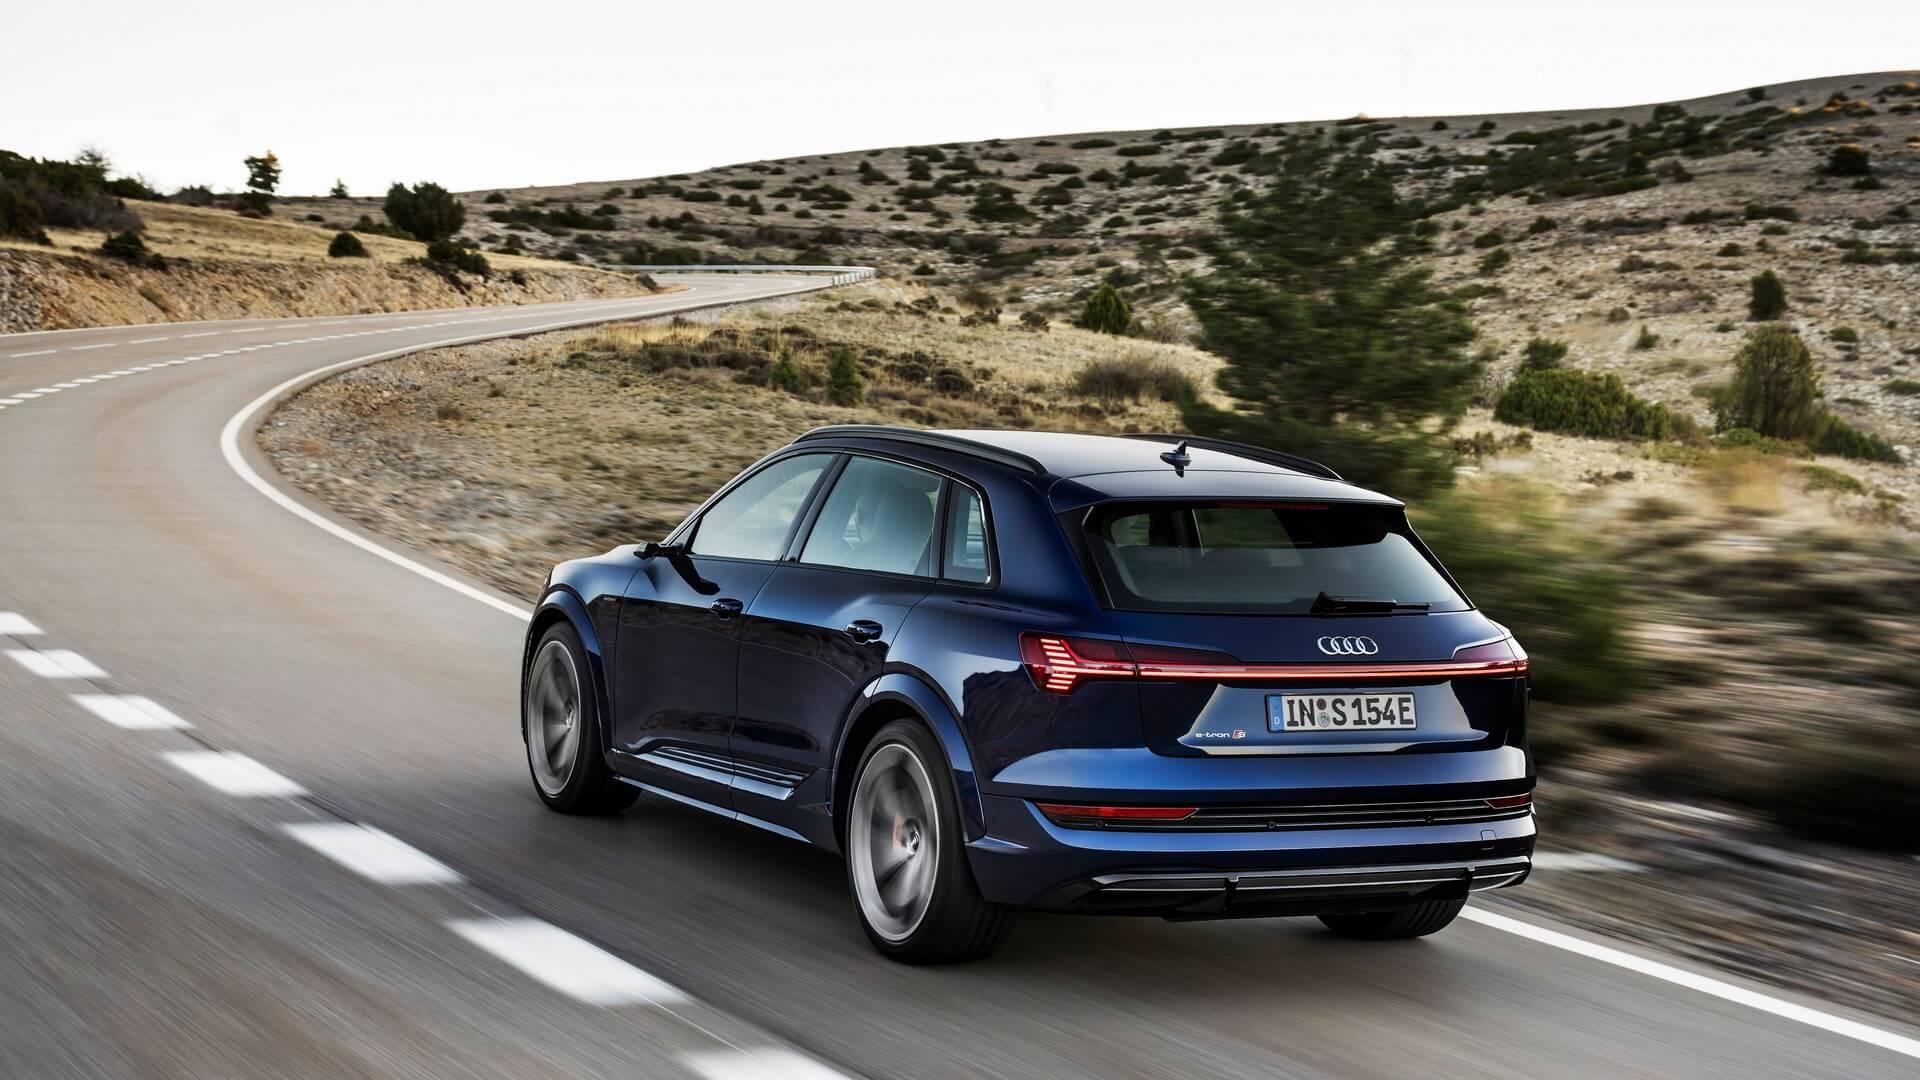 Audi-E-Tron-S-and-E-Tron-S-Sportback-2020-7